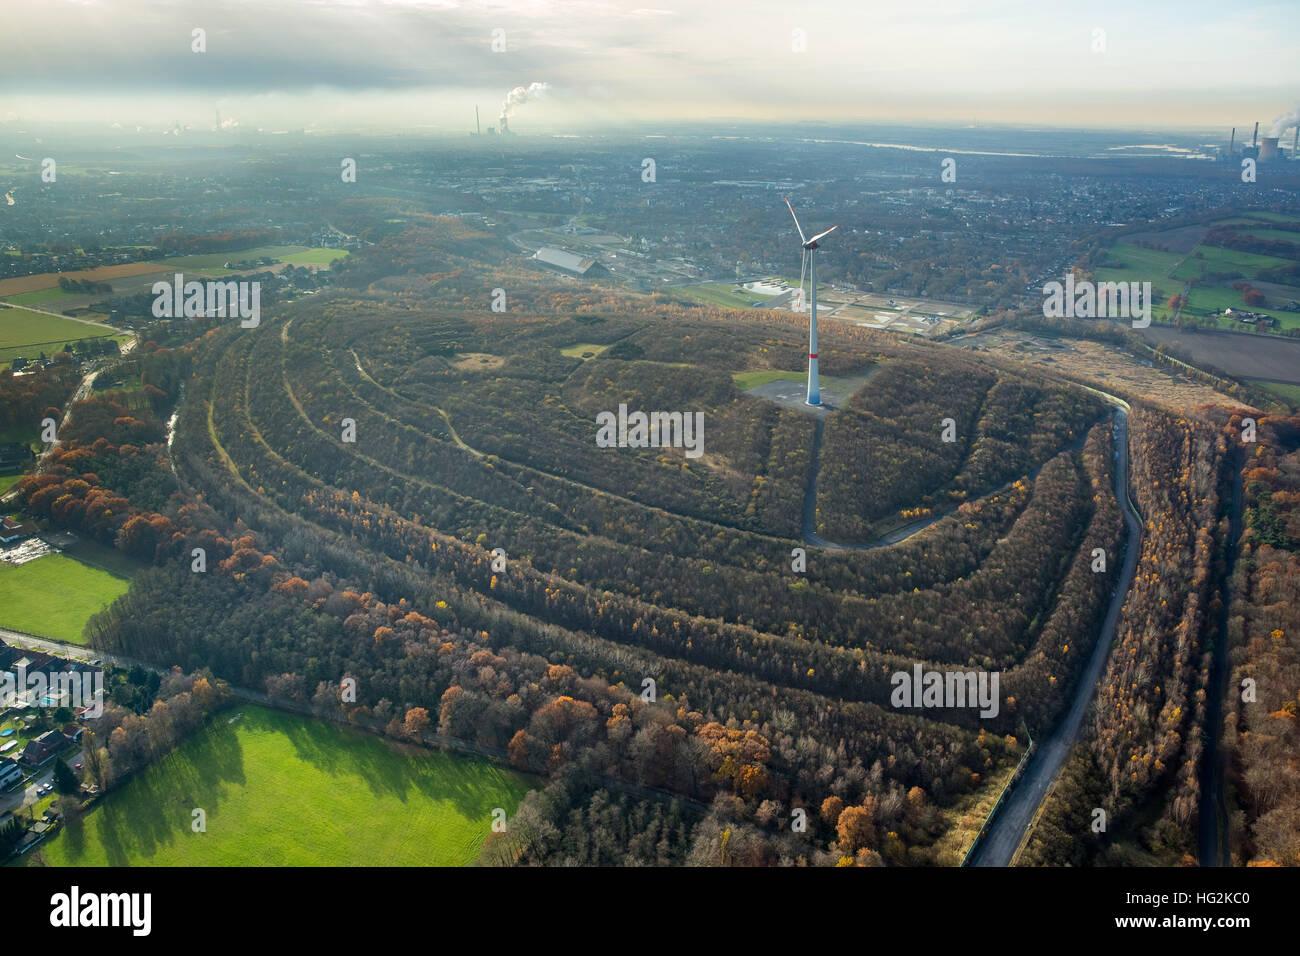 Aerial view, stockpile Oberlohberg, mountains halde, Dinslaken, Ruhr aeria, north rhine-westphalia, Germany, Europe, - Stock Image